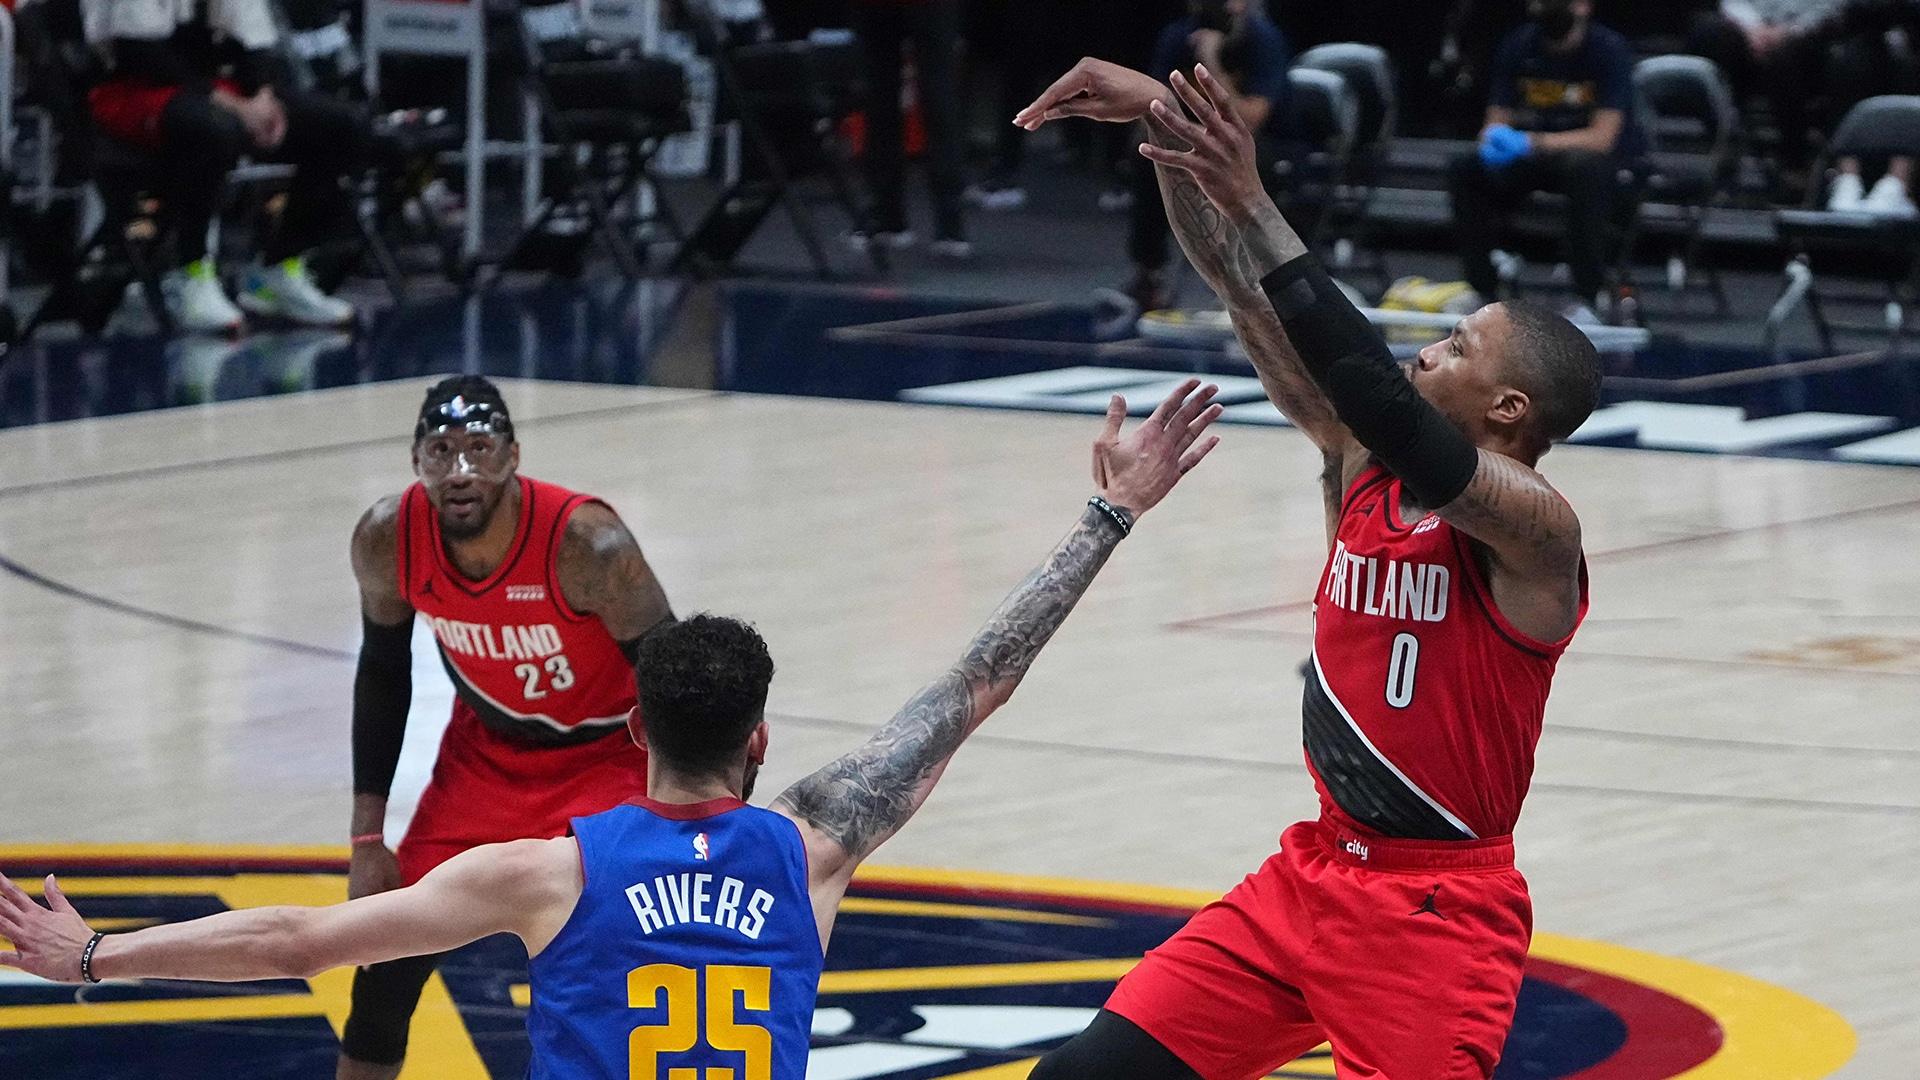 Denver tops Portland in a 2OT Instant classic